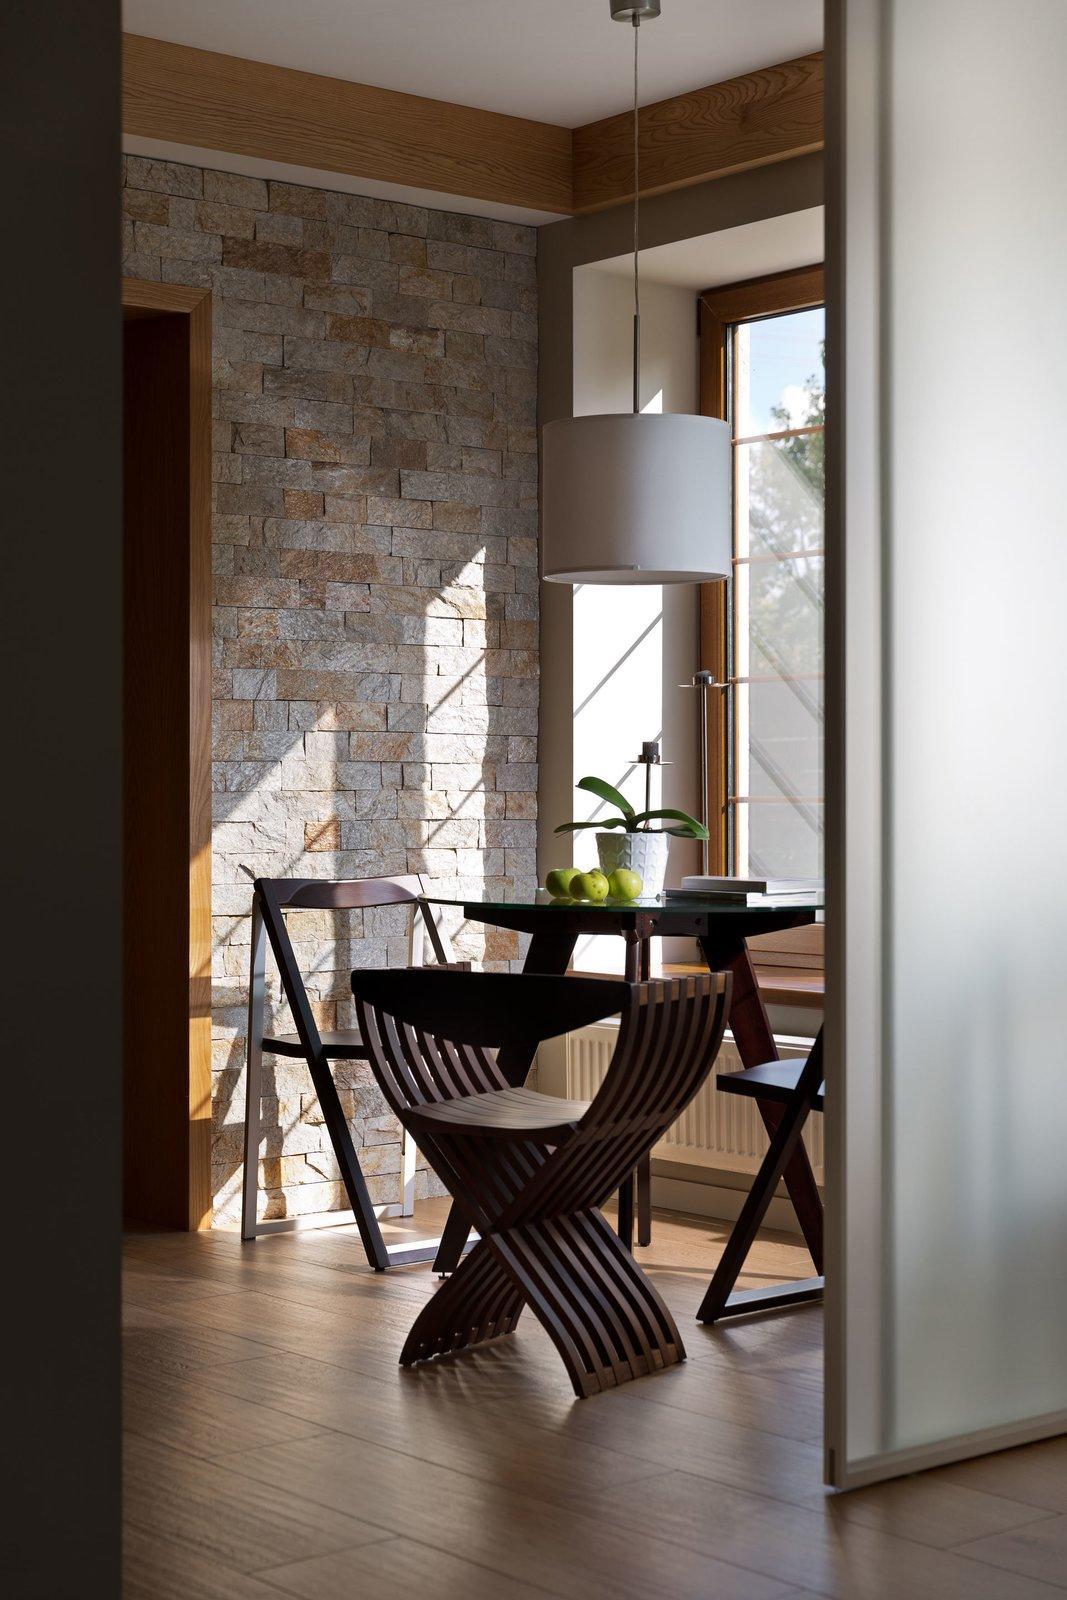 Kitchen, Stone Tile Backsplashe, Medium Hardwood Floor, Pendant Lighting, and Wood Cabinet  House Lightray